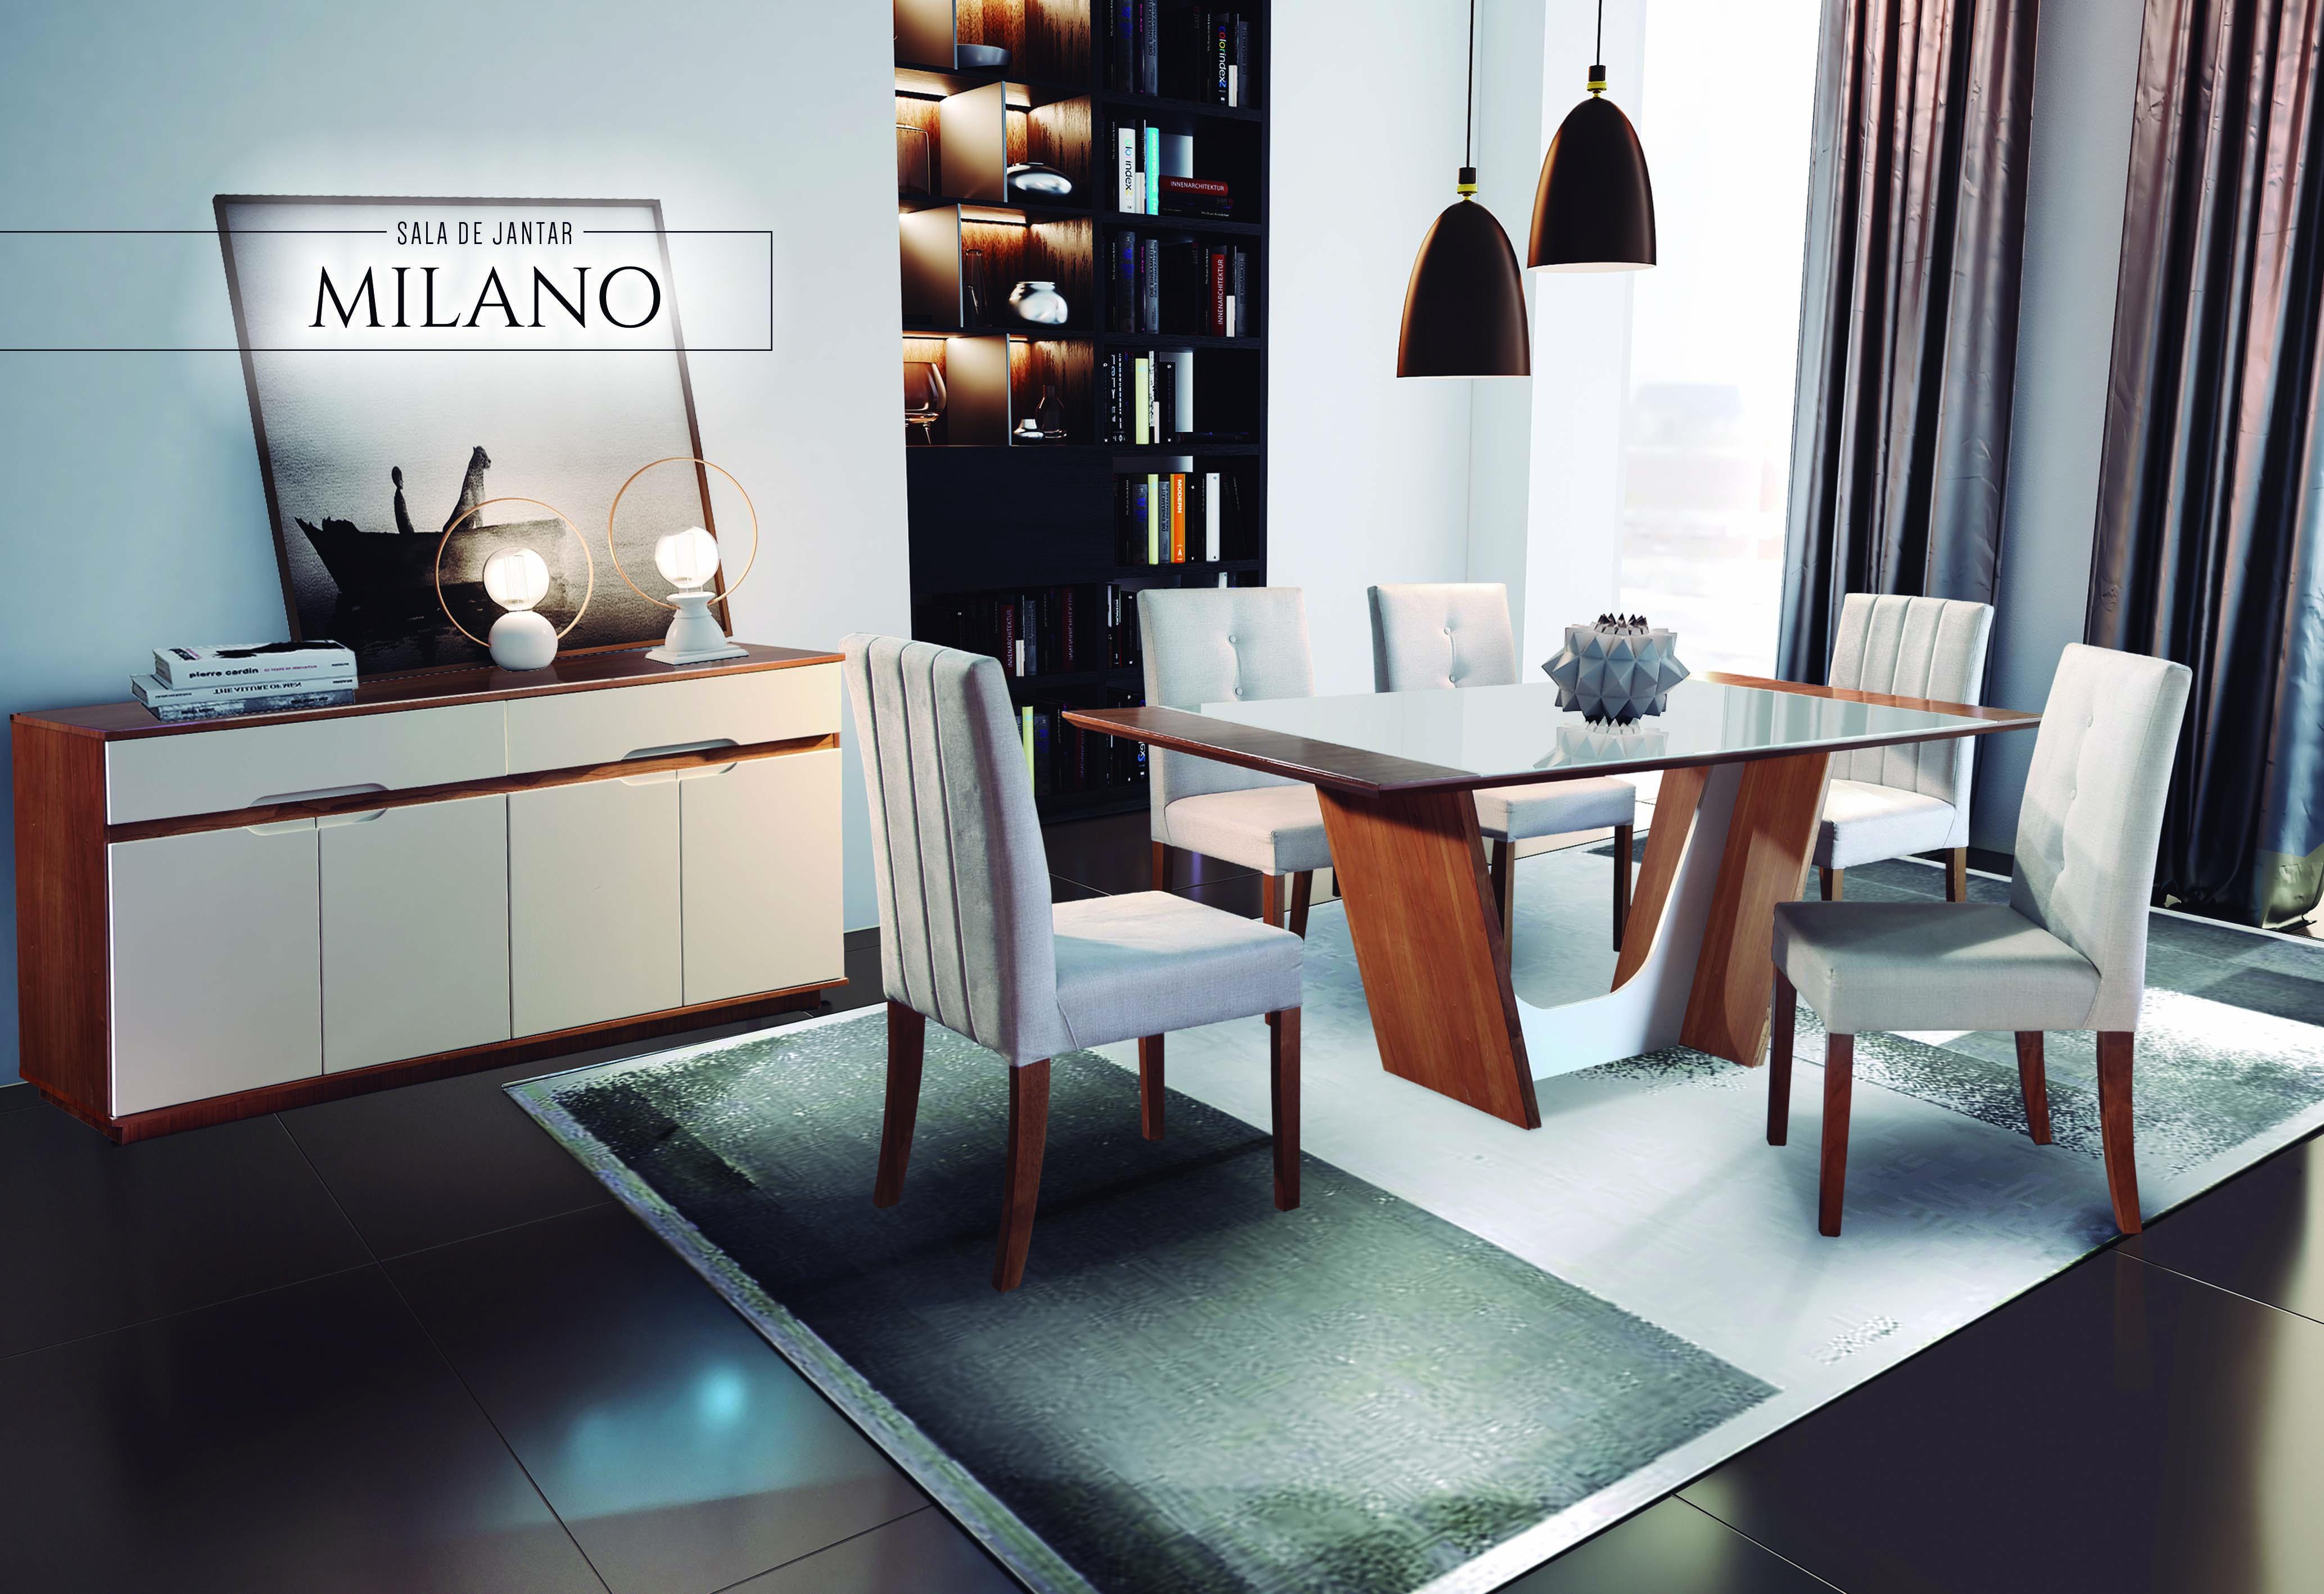 Sala de Jantar Milano